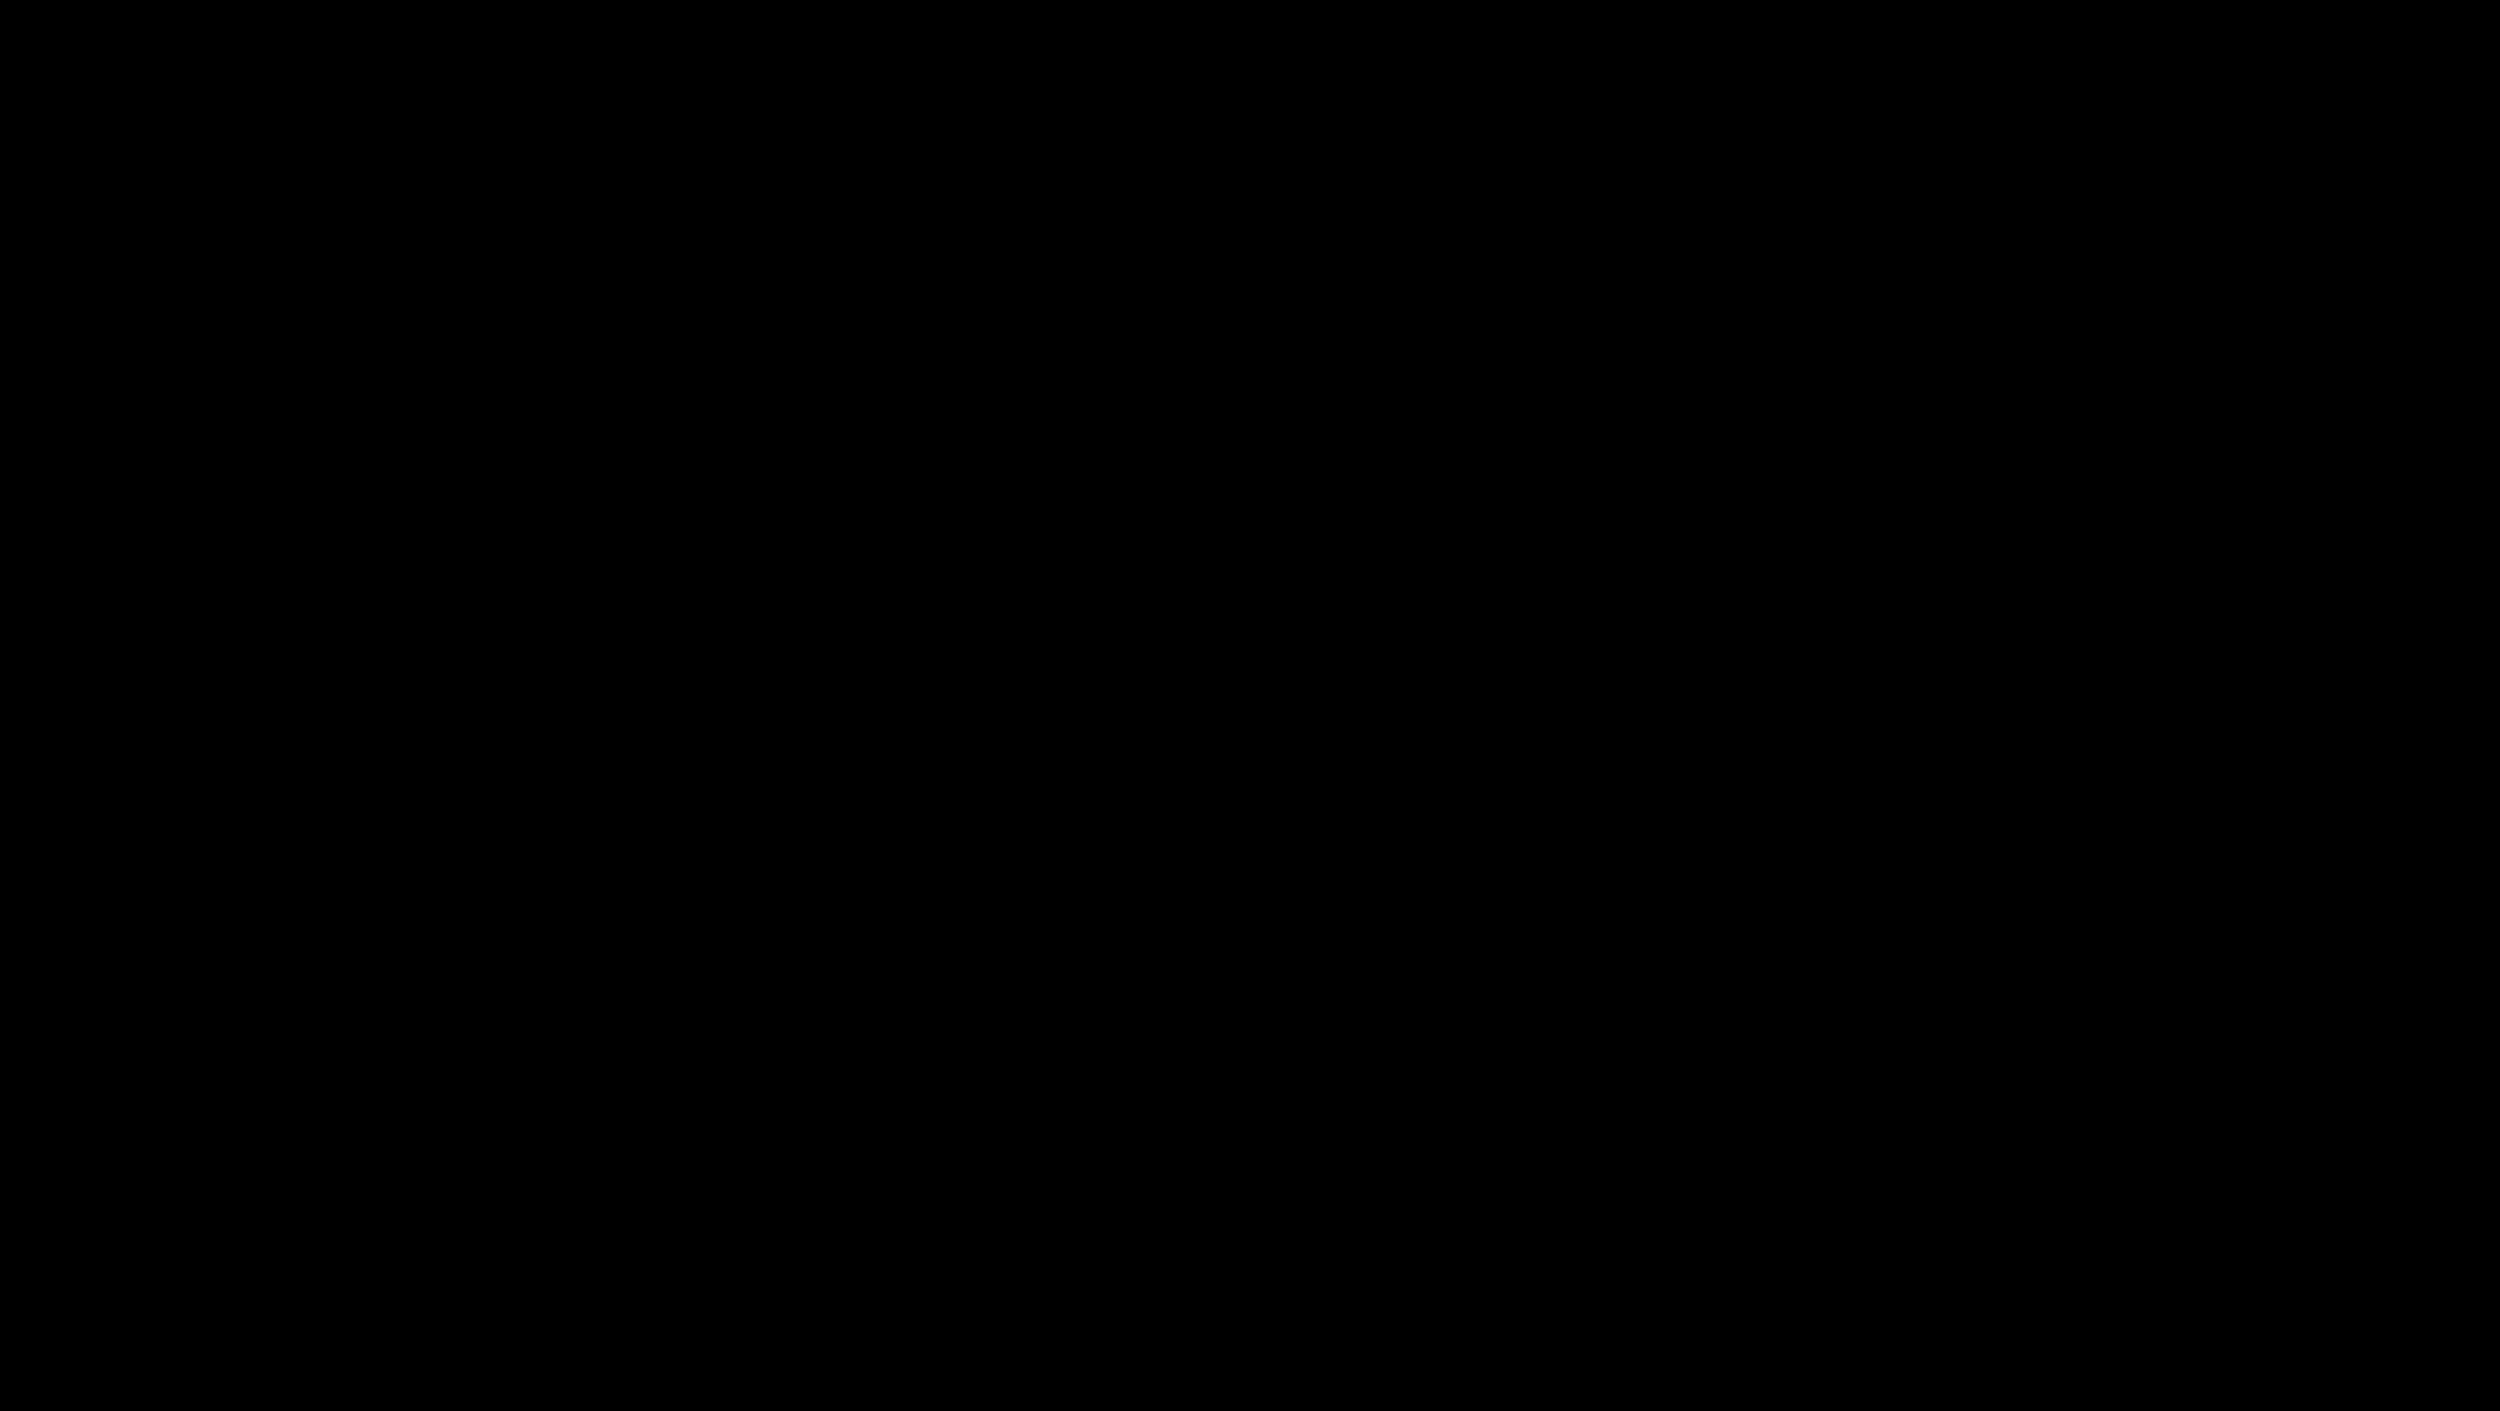 luuc logo schwarz.png